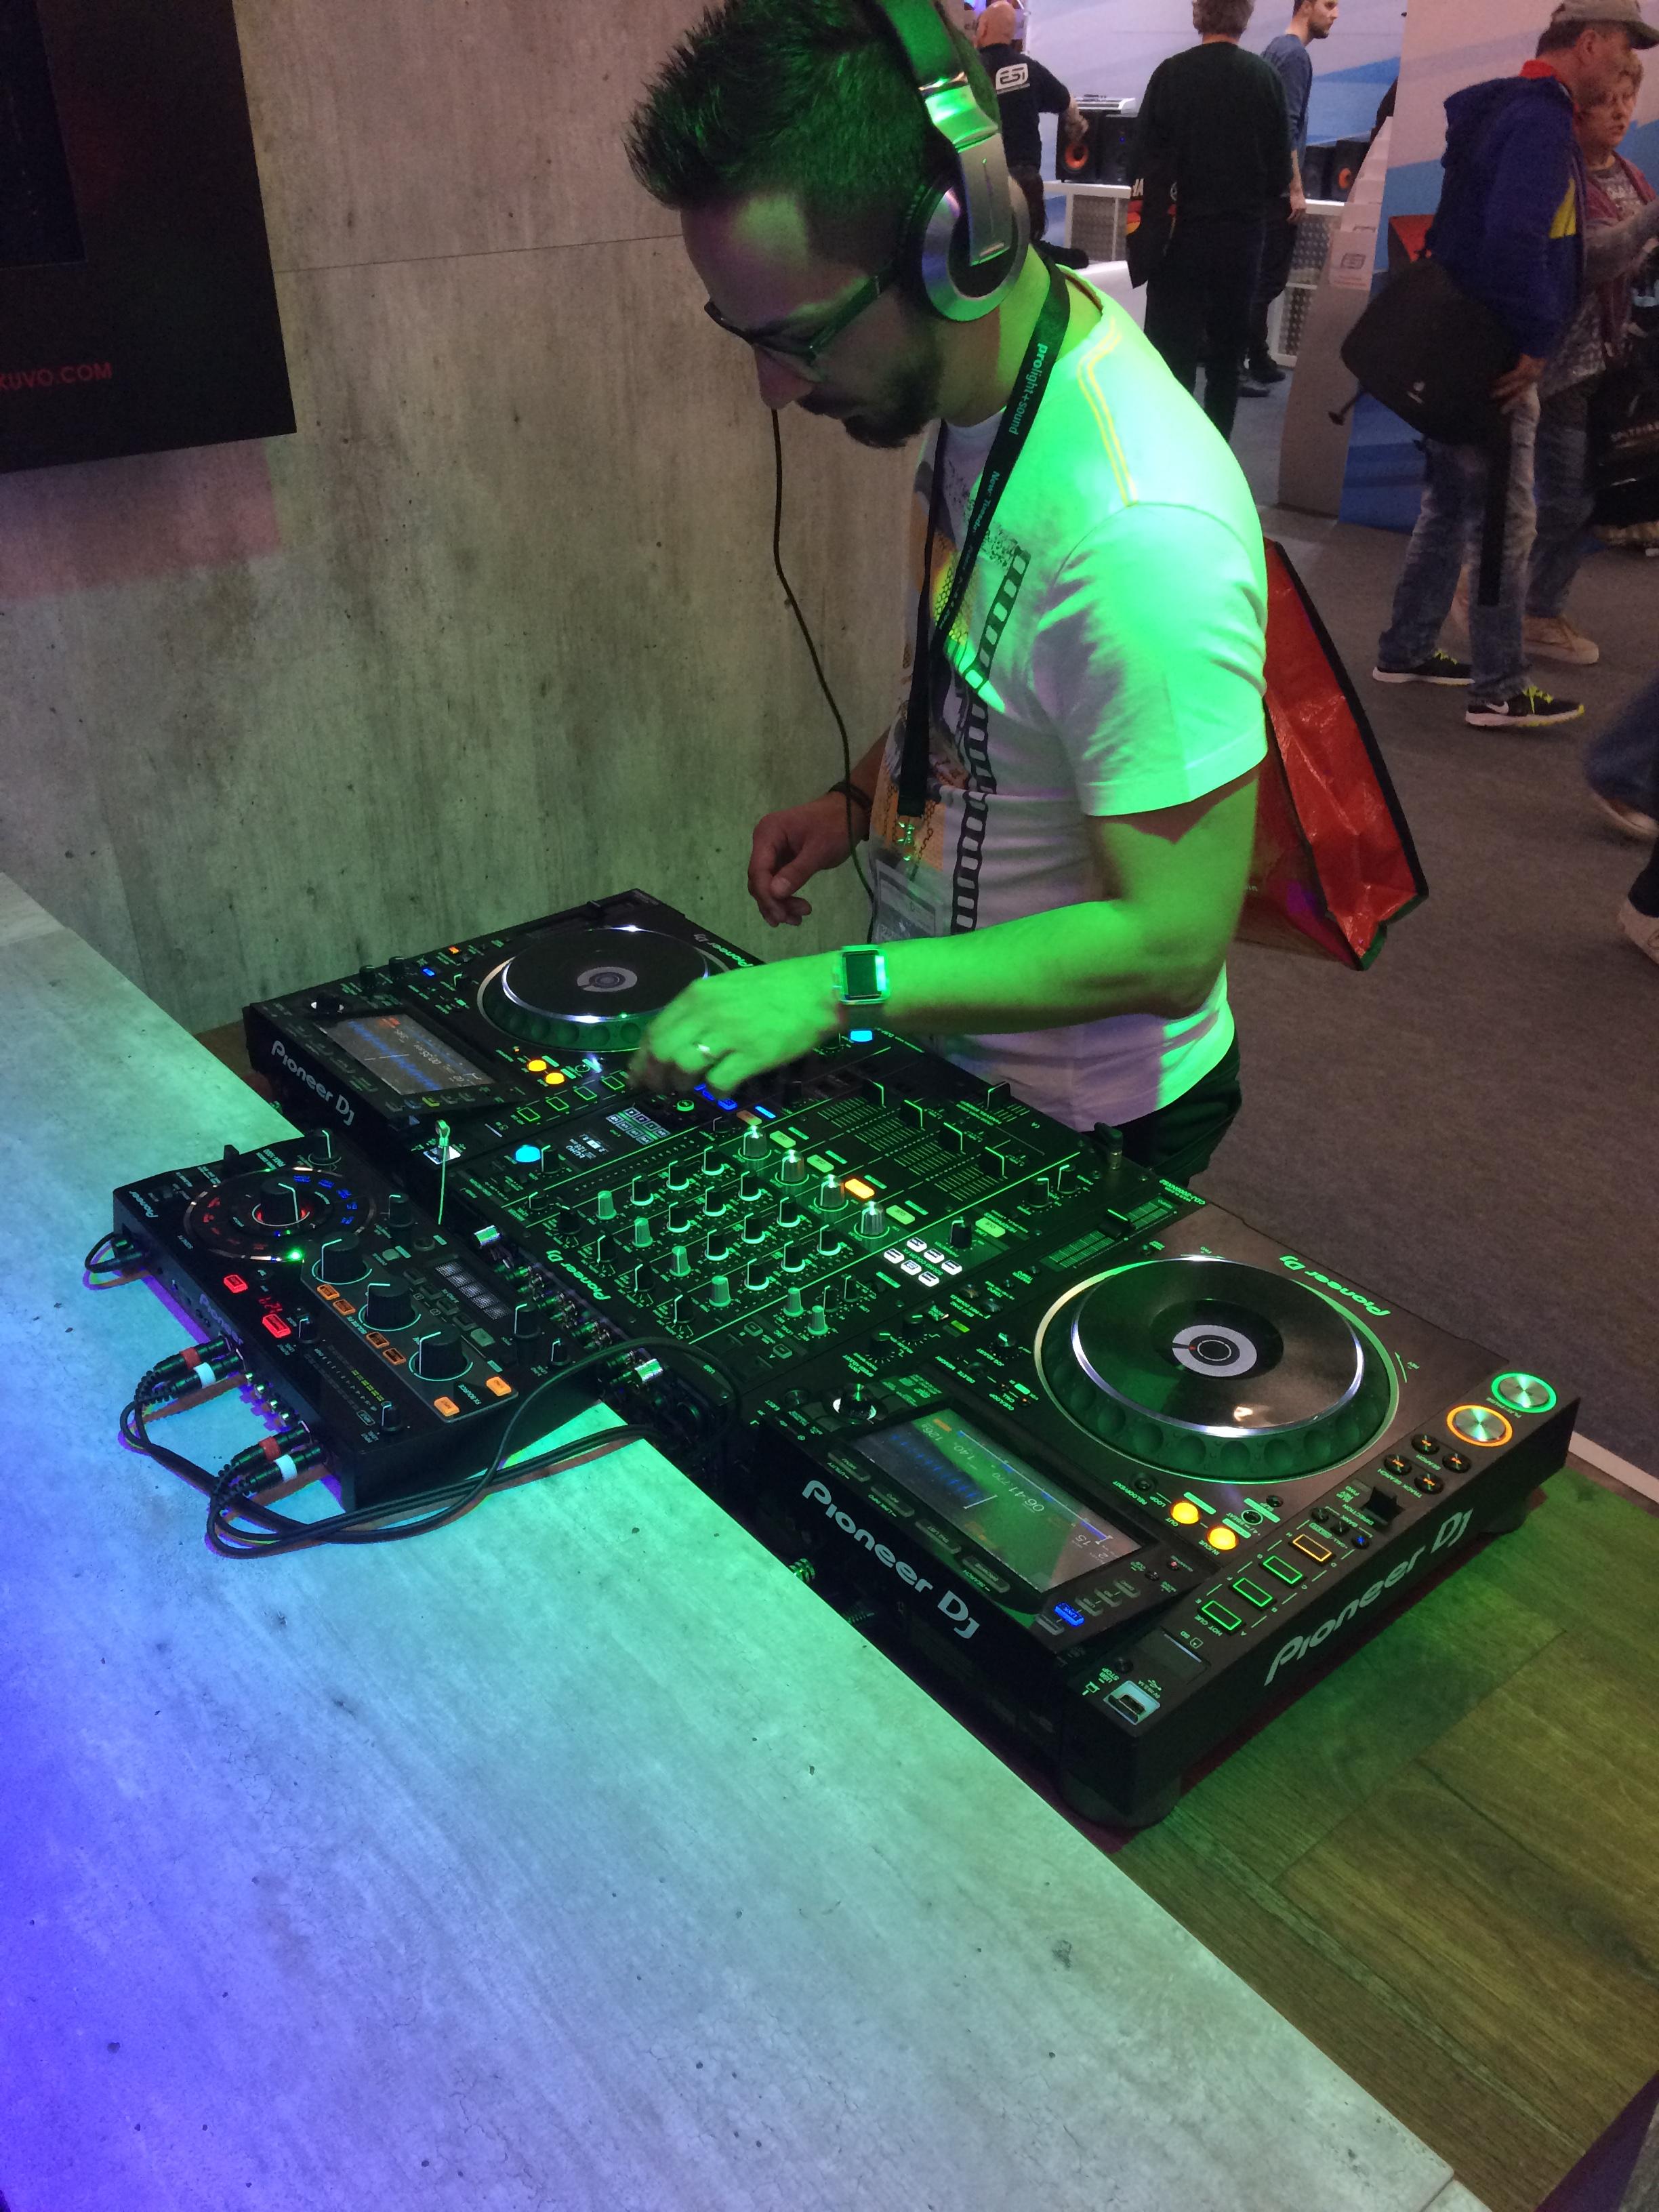 musikmesse-nxs2-setup-rmx-500